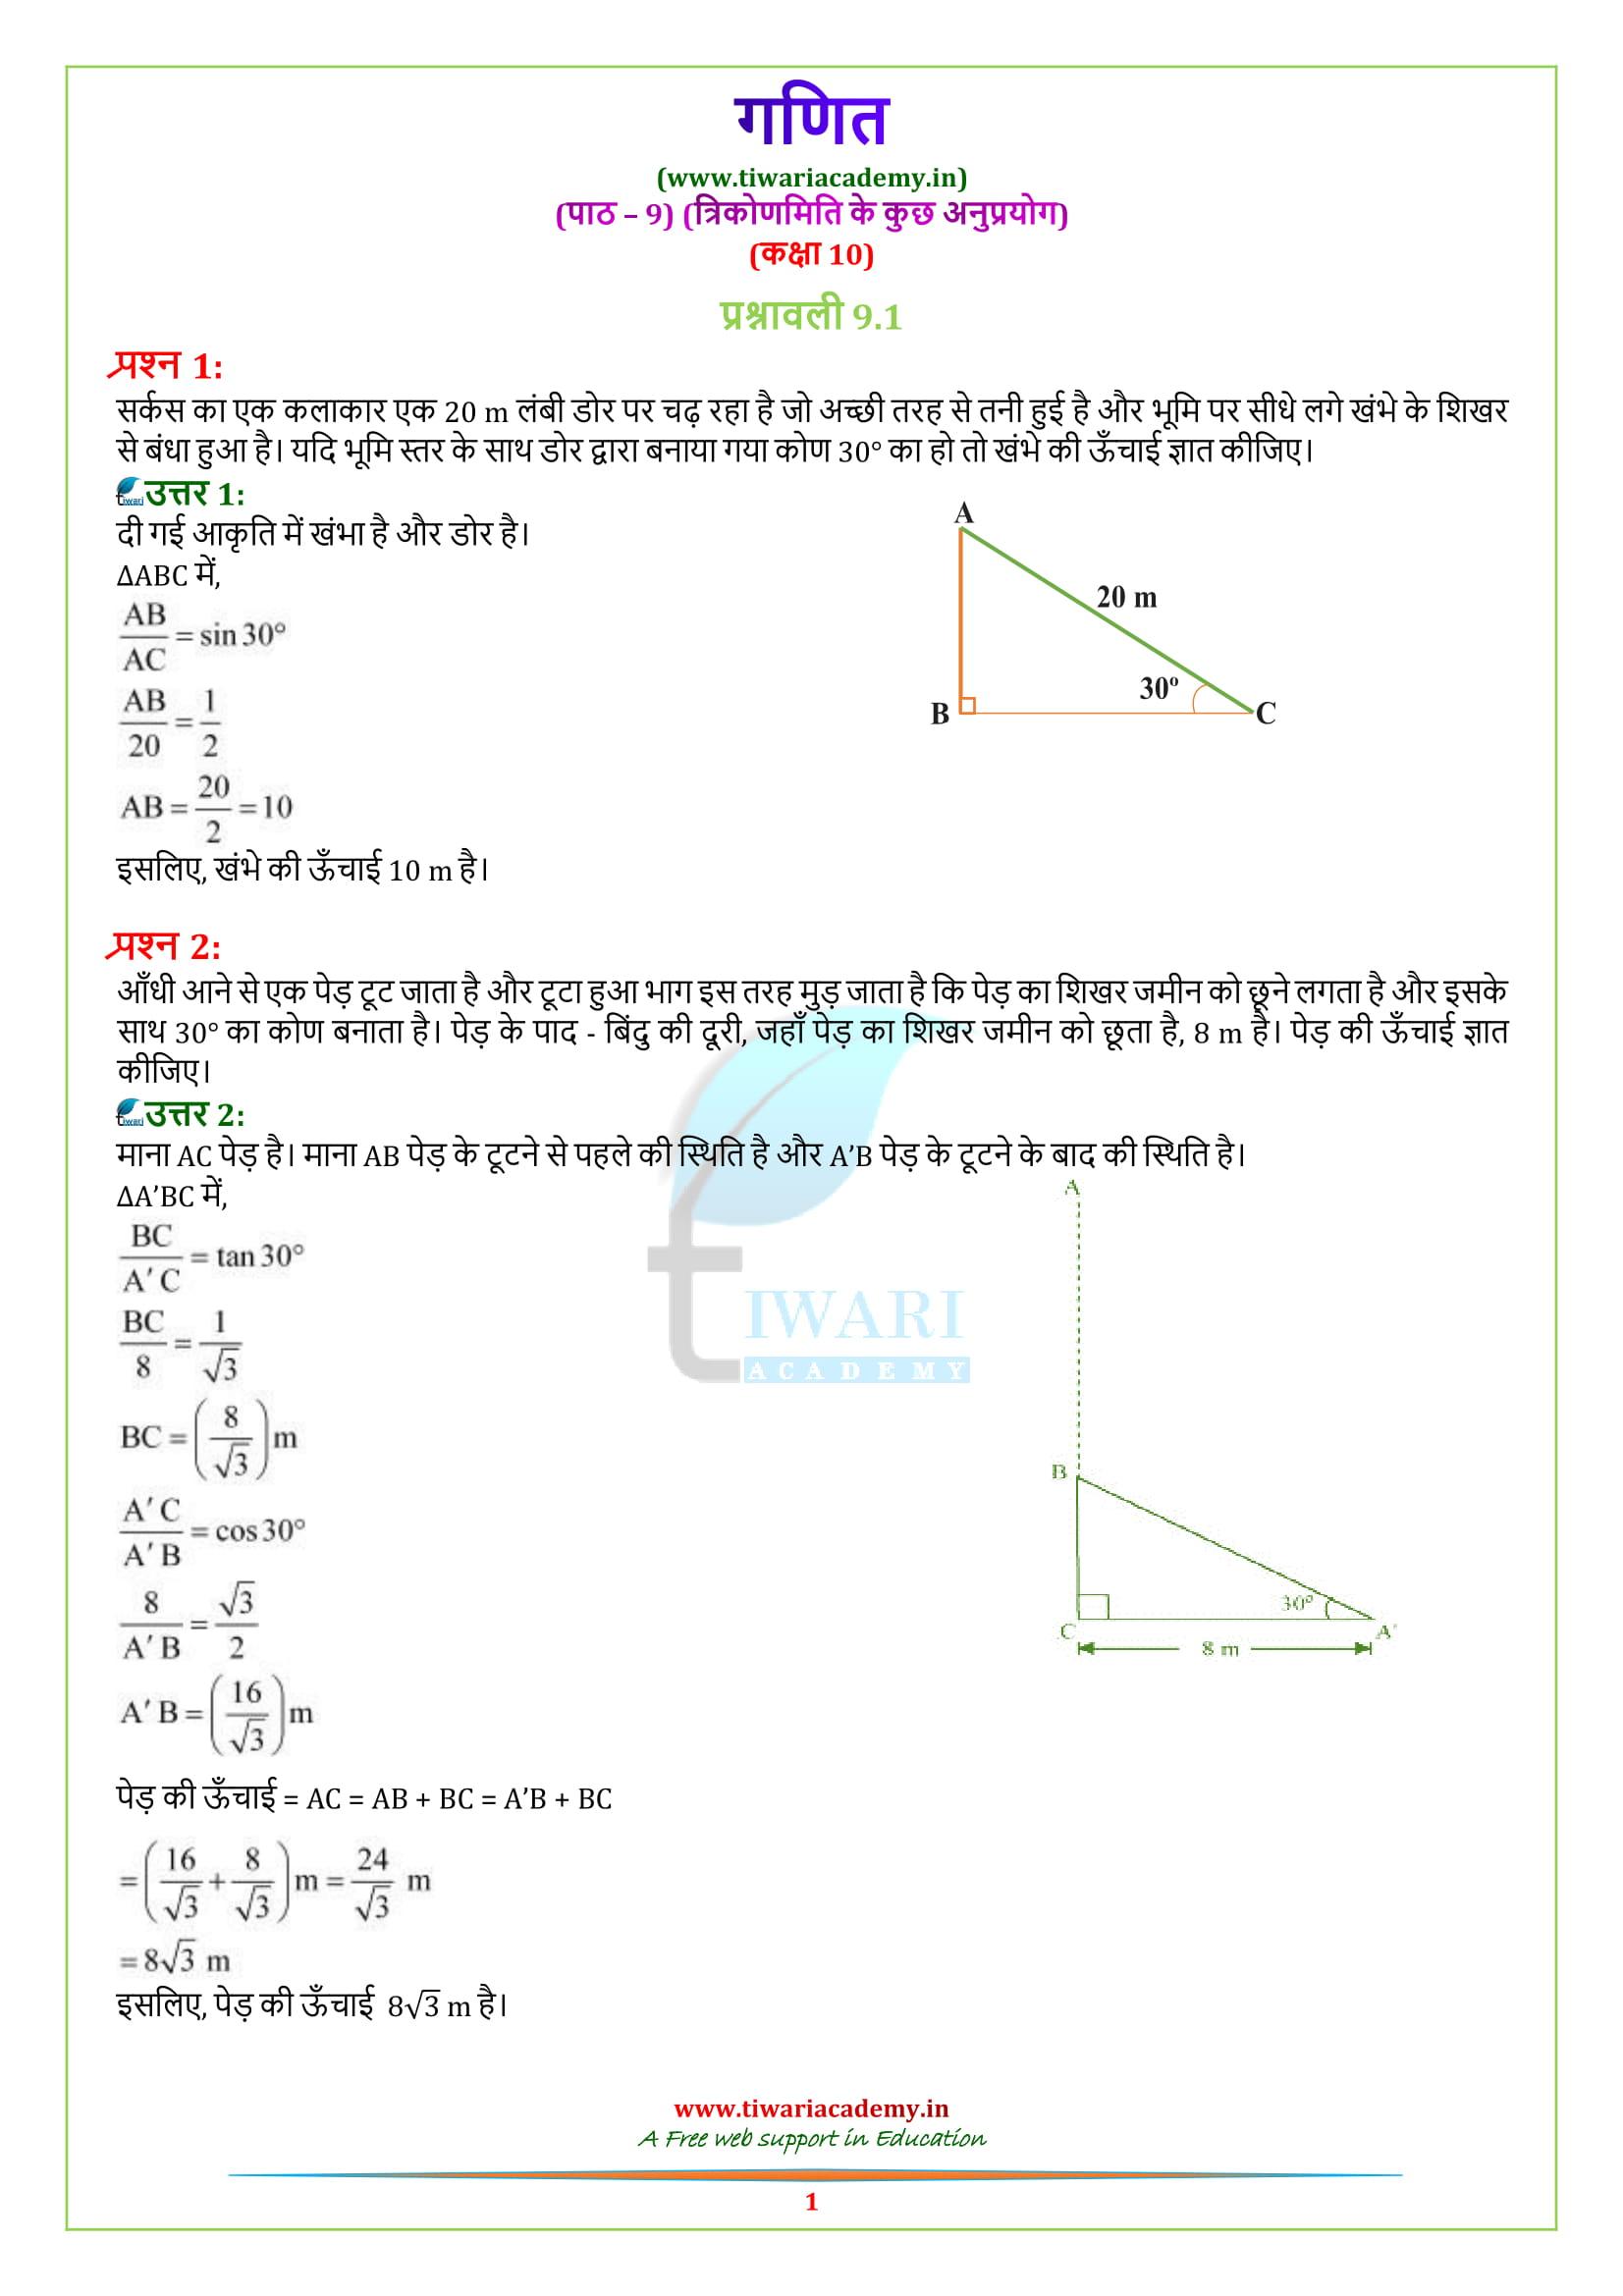 Class 10 Maths Exercise 9.1 question 1, 2, 3